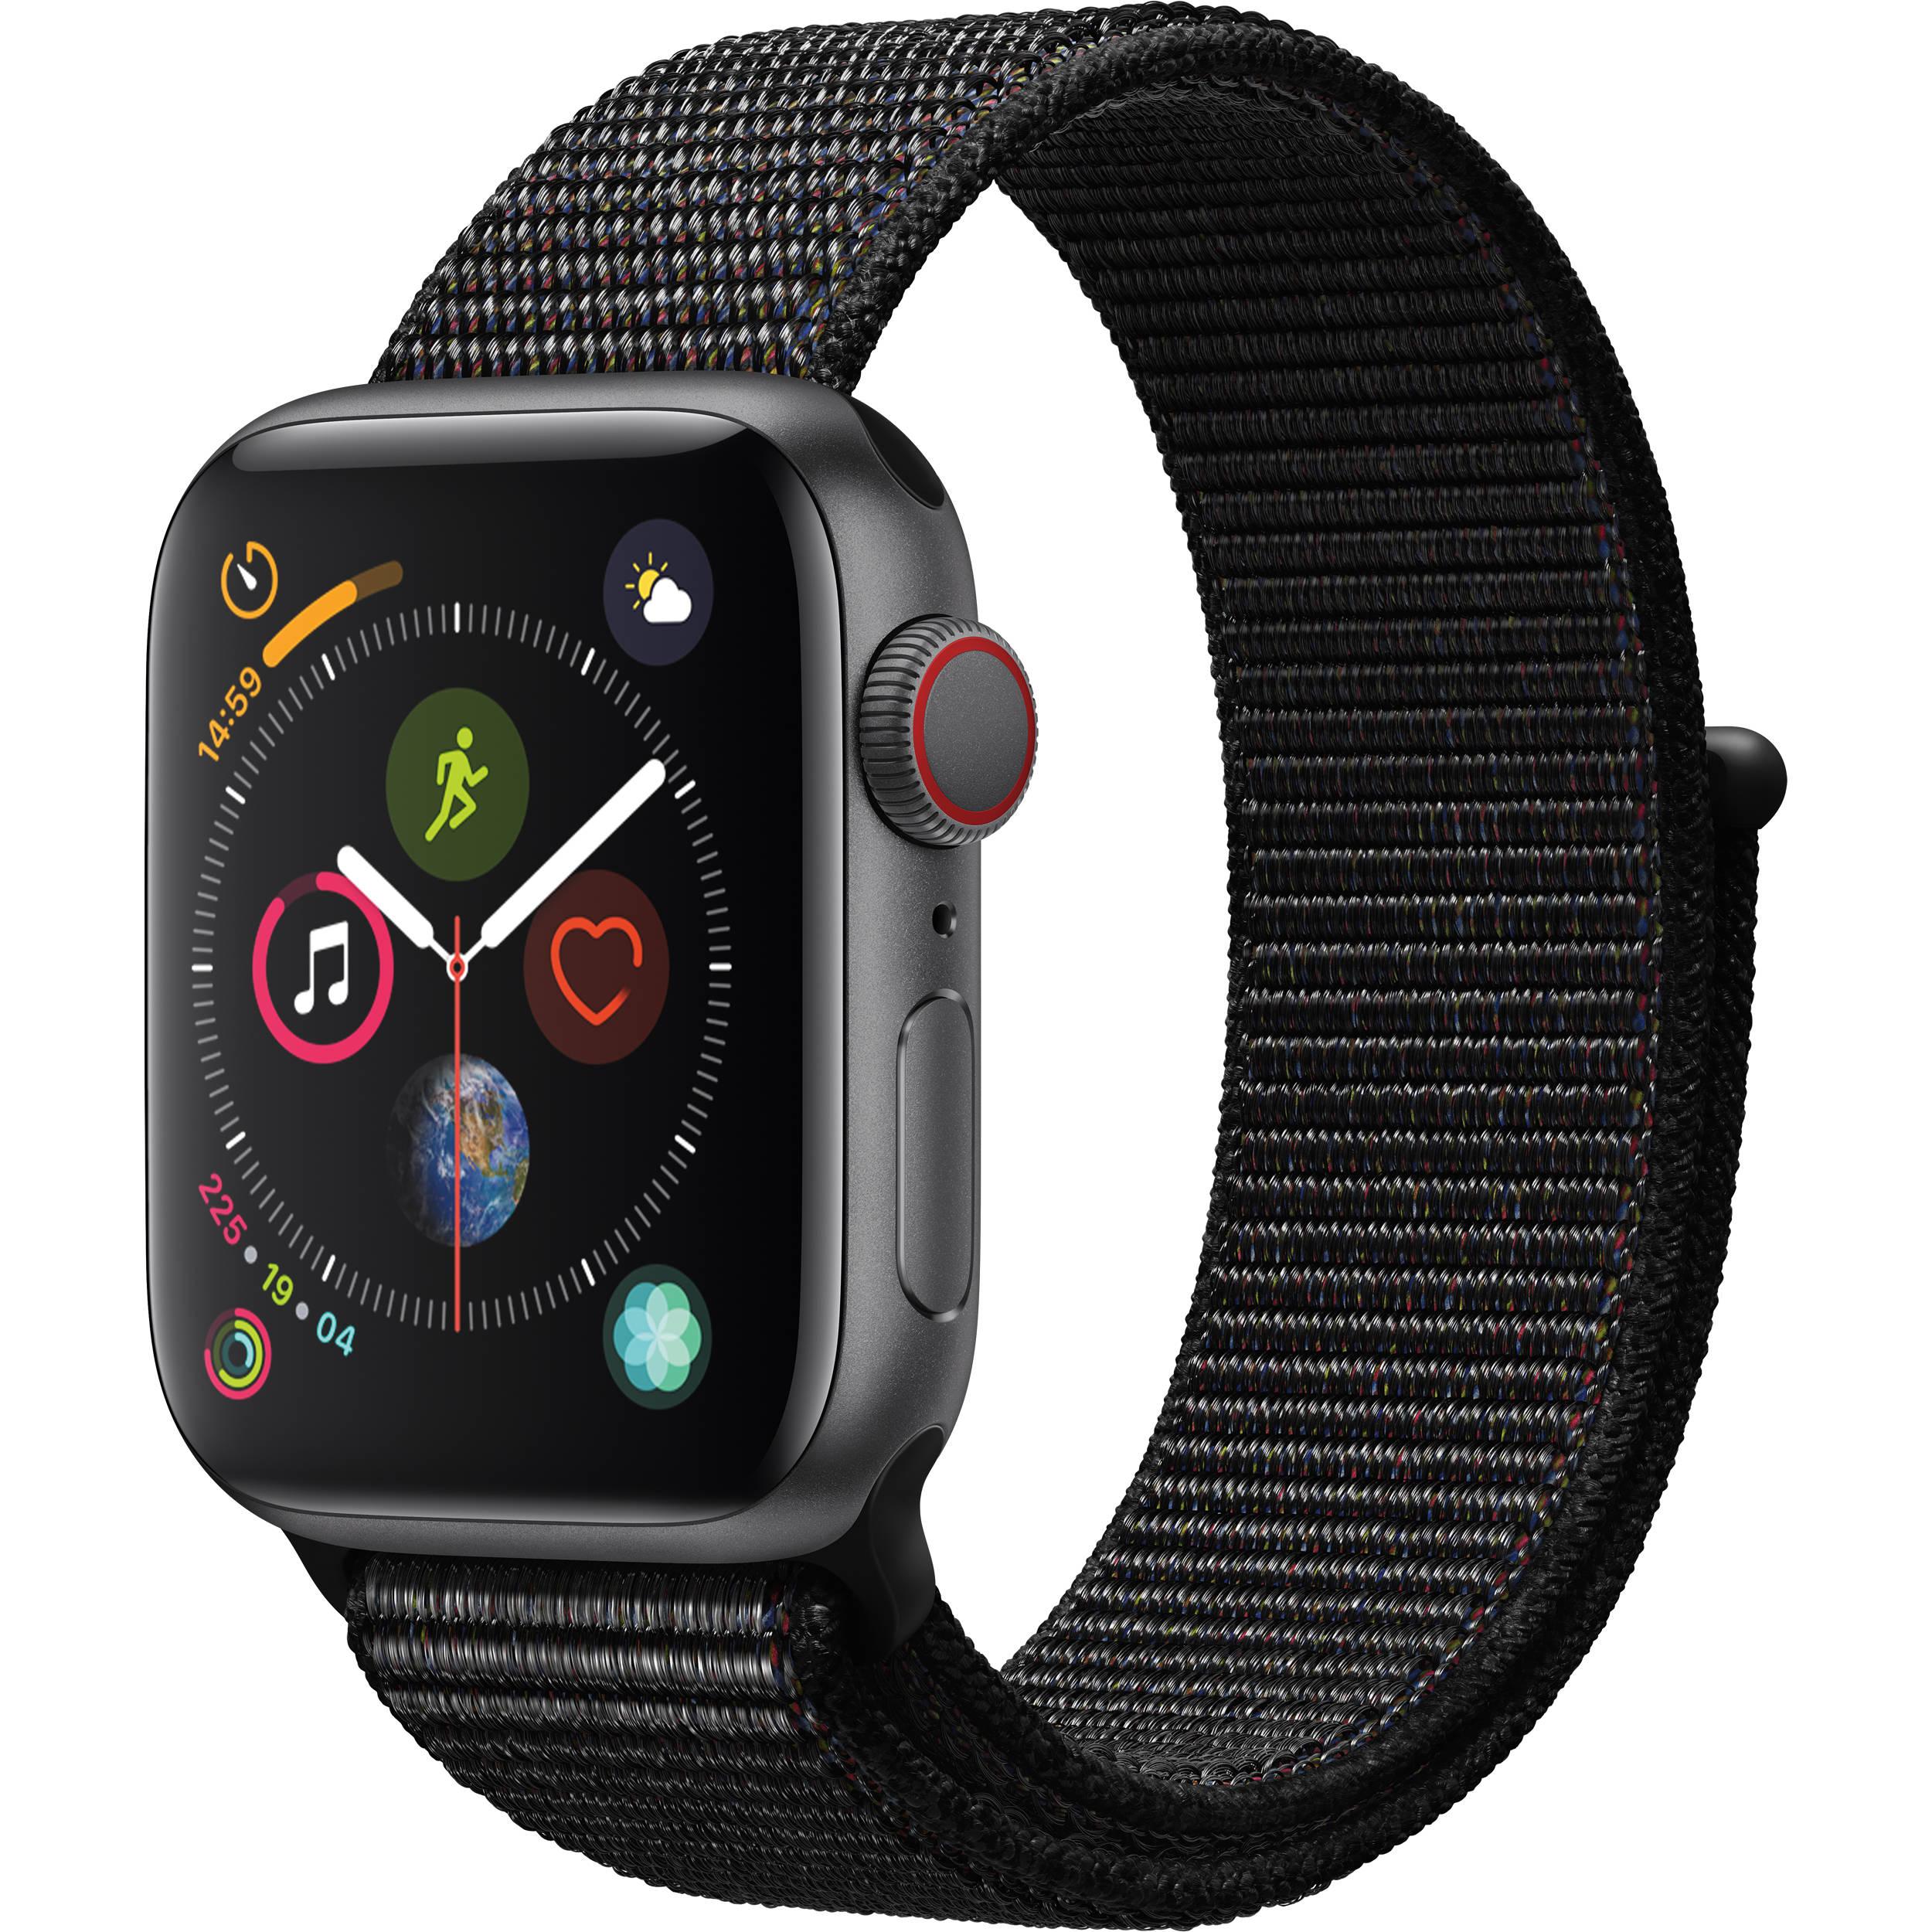 Apple Watch Series 4 (GPS + Cellular, 40mm, Space Gray Aluminum, Black  Sport Loop)